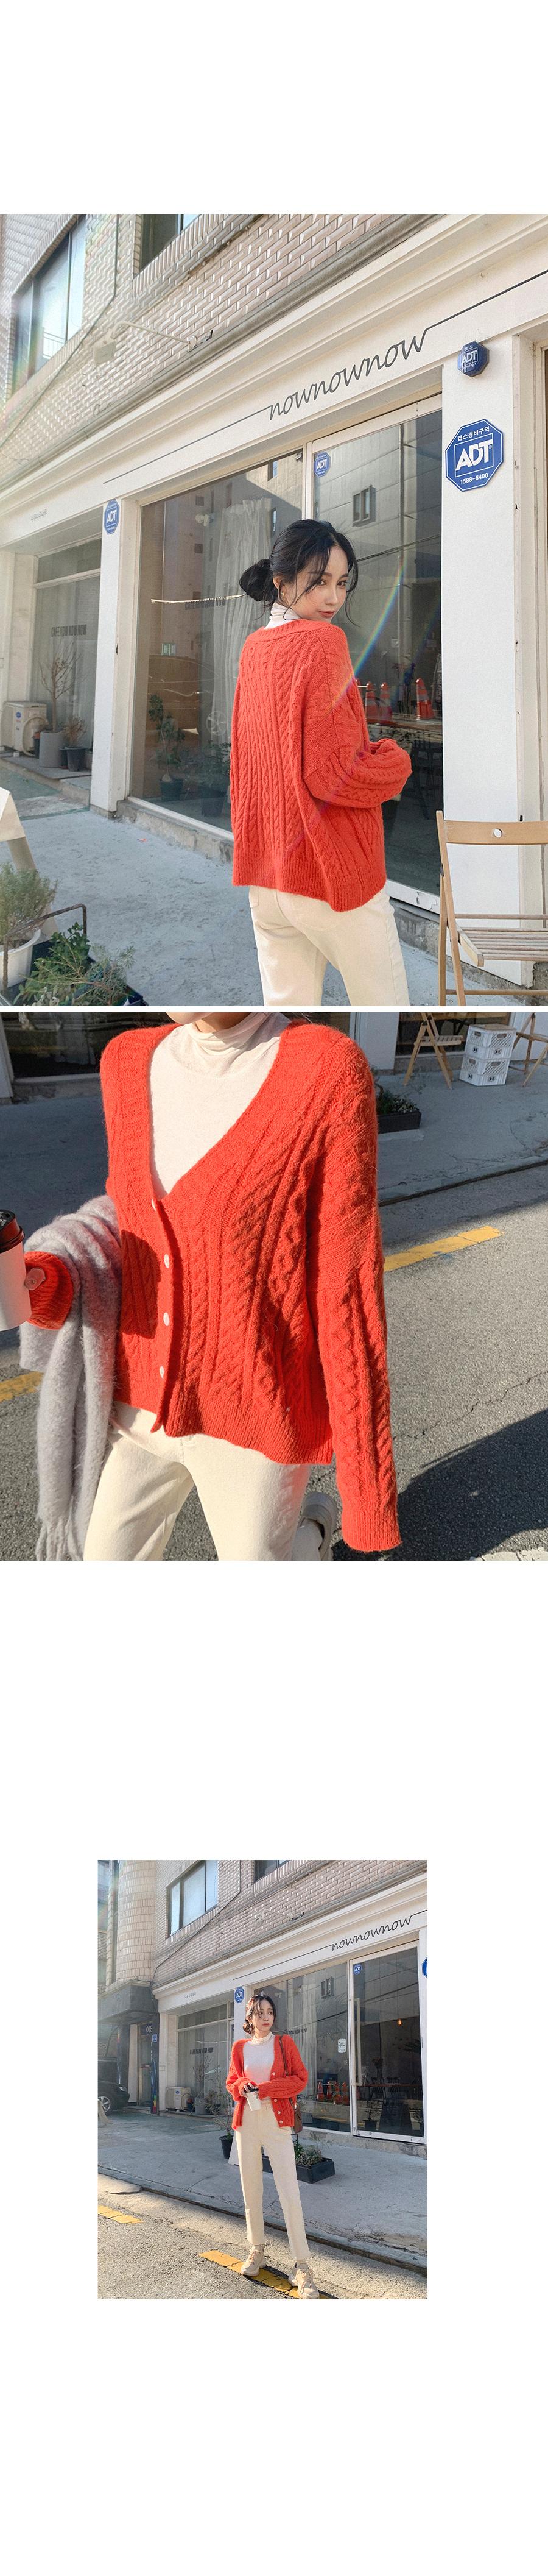 Point Twisted Knitwear Cardigan